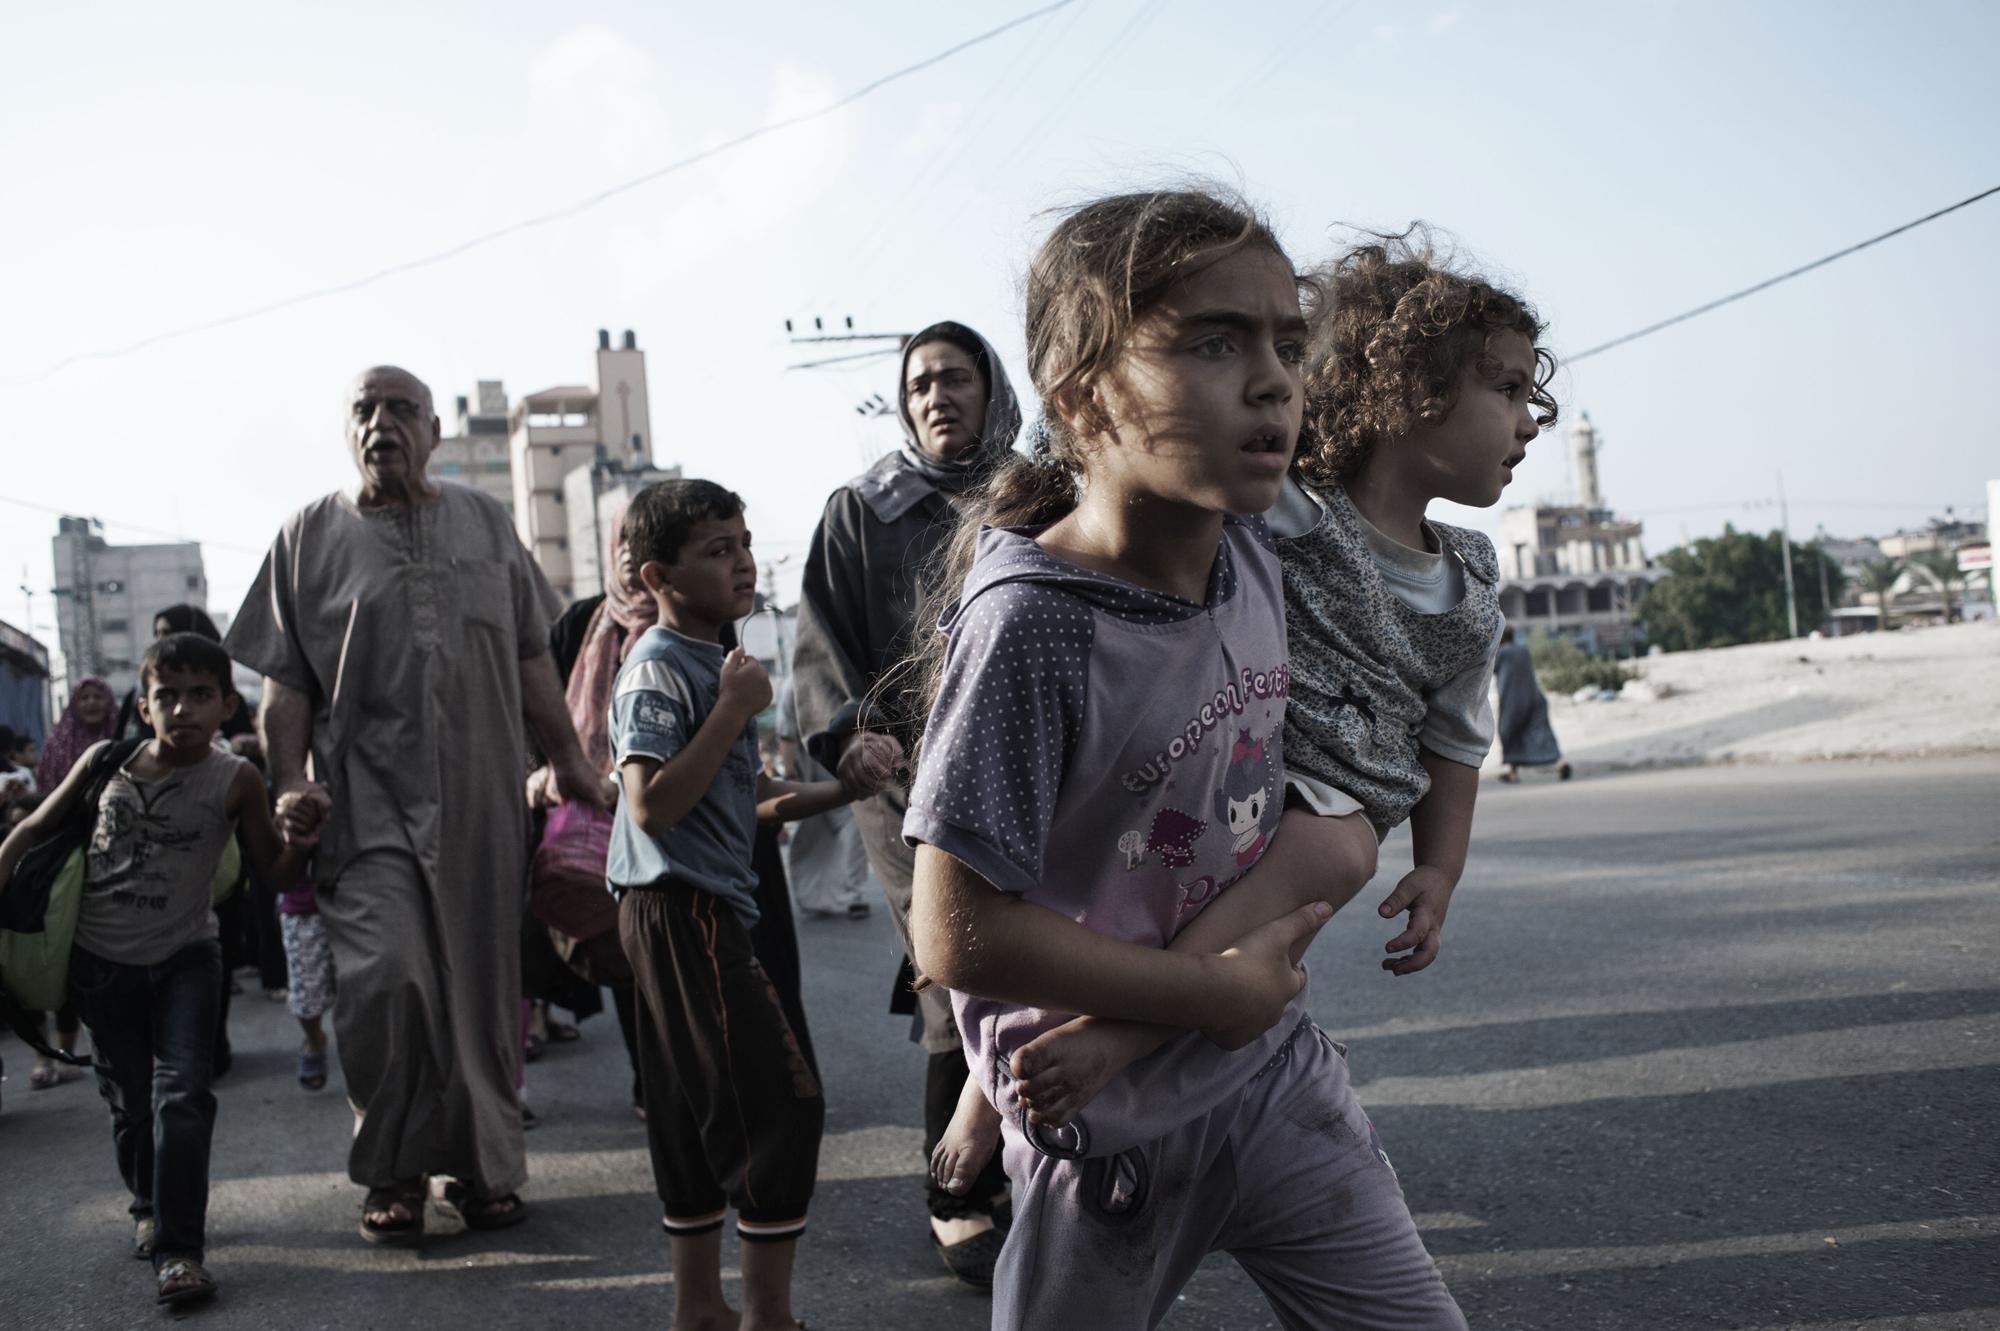 Palestinians flee the Shujayeh neighborhood during heavy shelling in Gaza City, July 20, 2014.